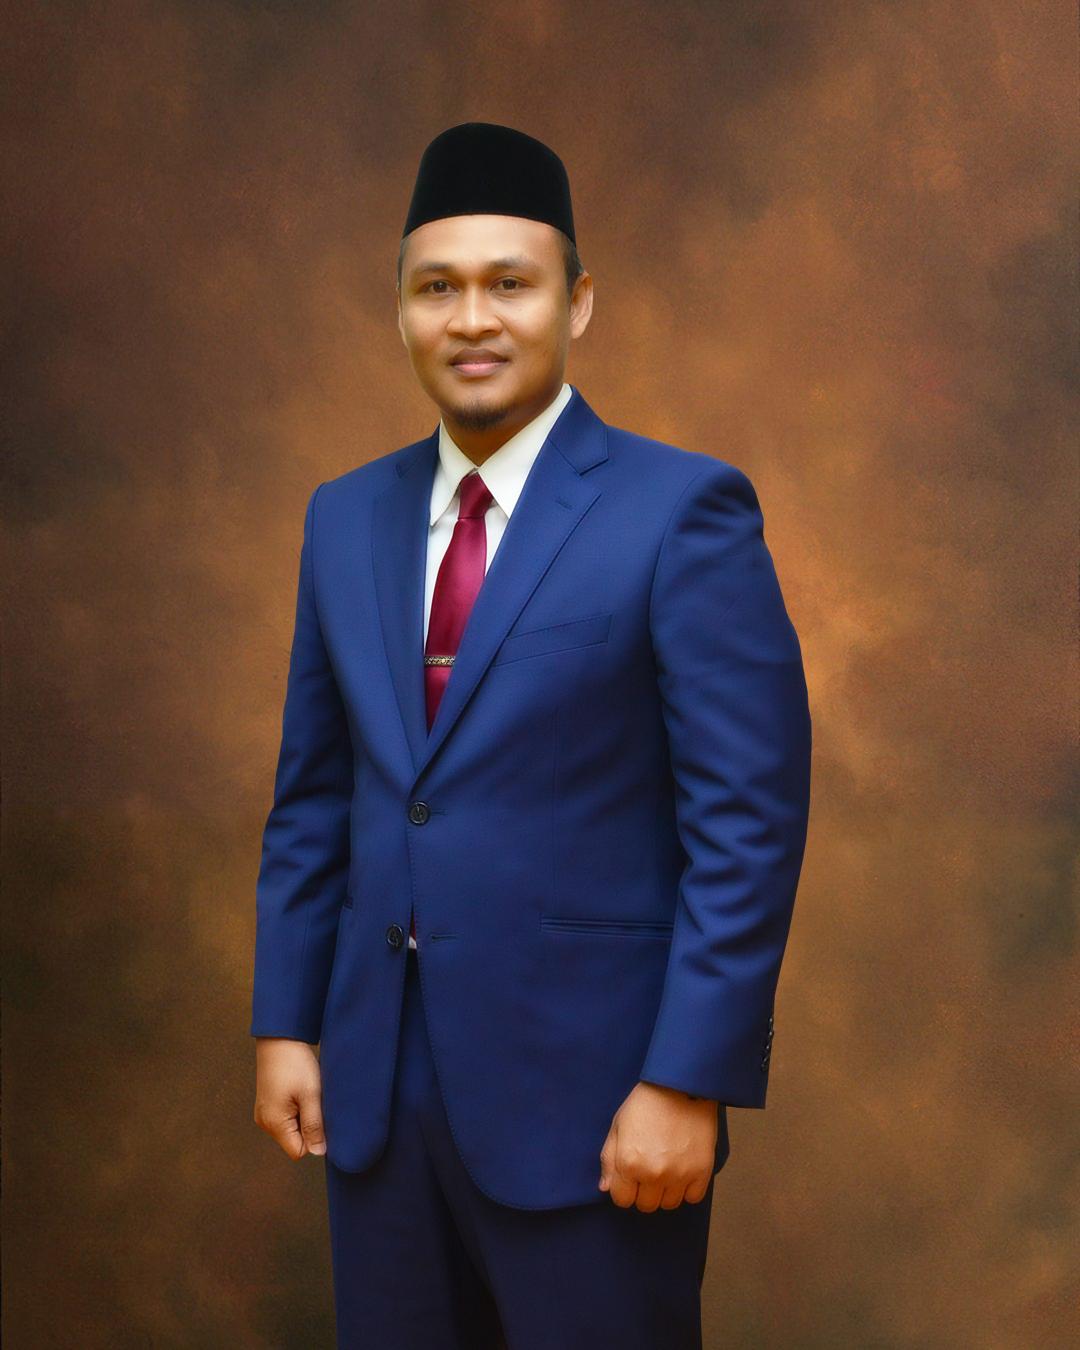 Encik Mohd Azrul bin Ismail